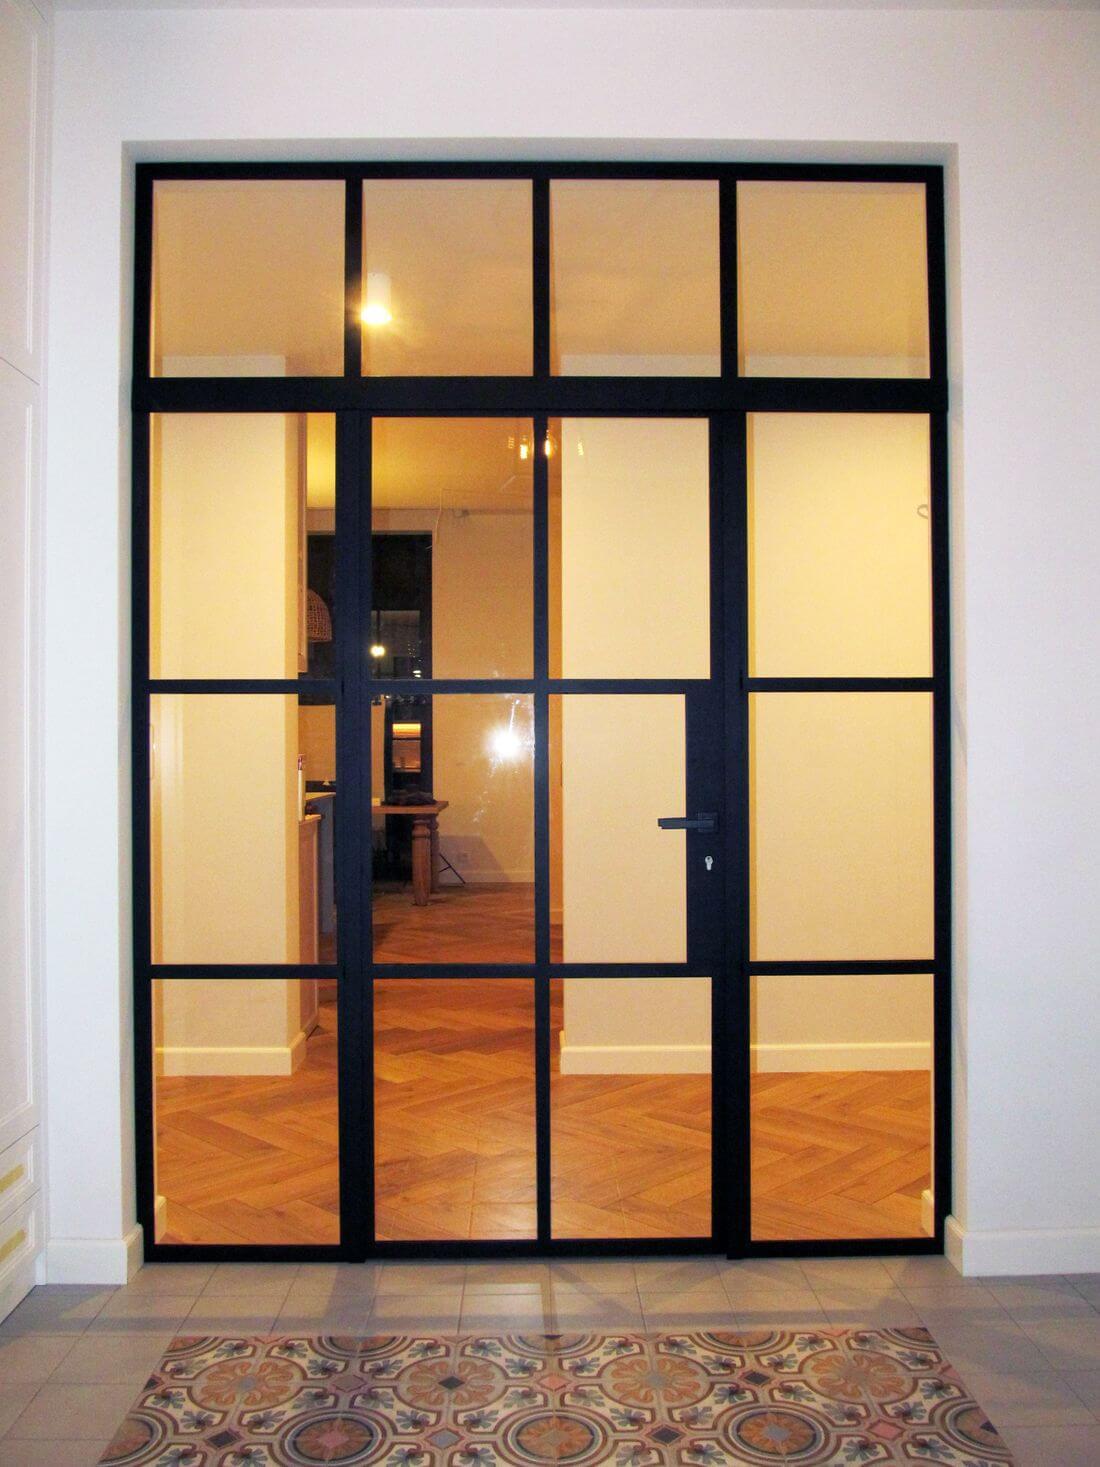 Glass Swing Loft Doors with Loft Walls illuminated by artificial light from corridor